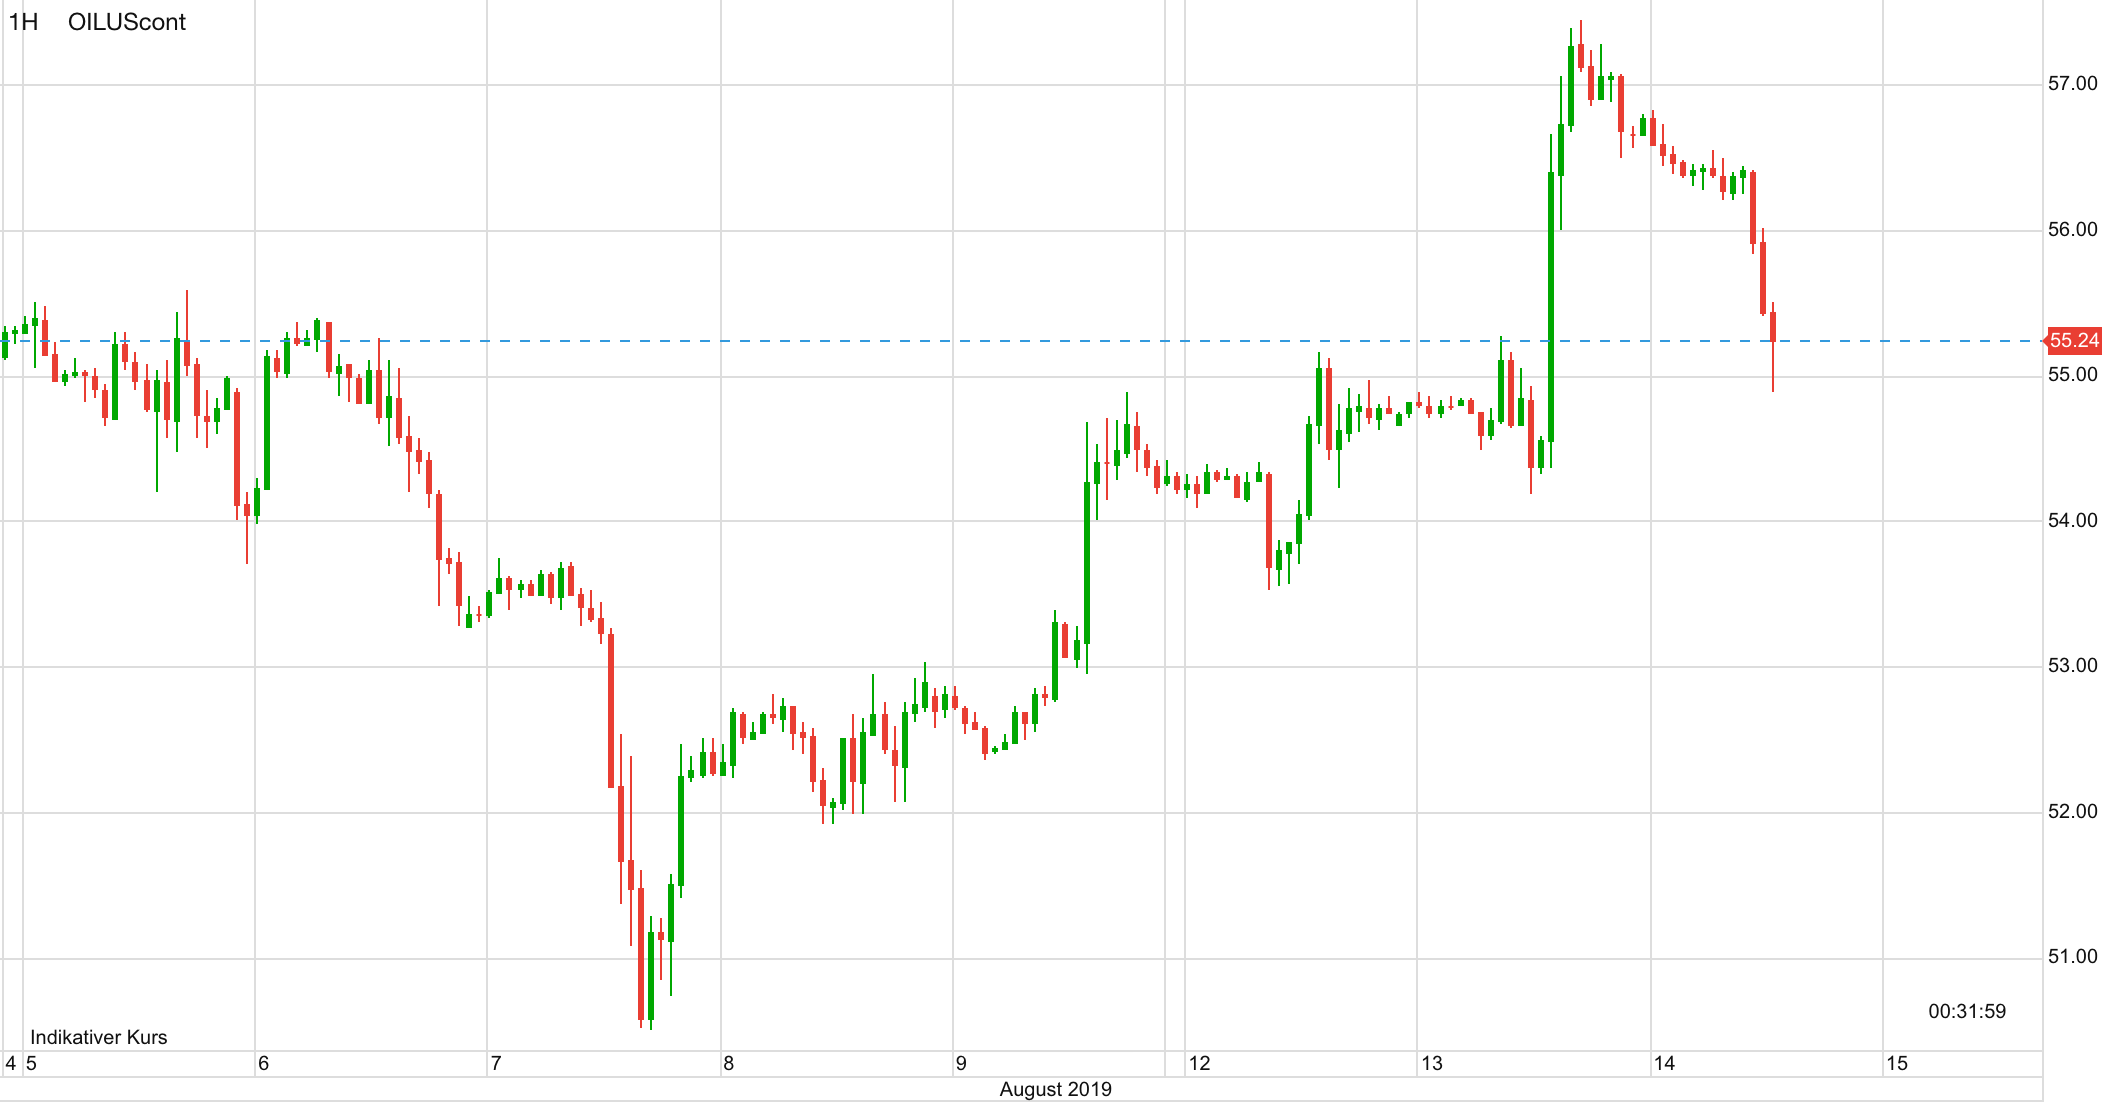 Ölpreis WTI seit dem 5. August